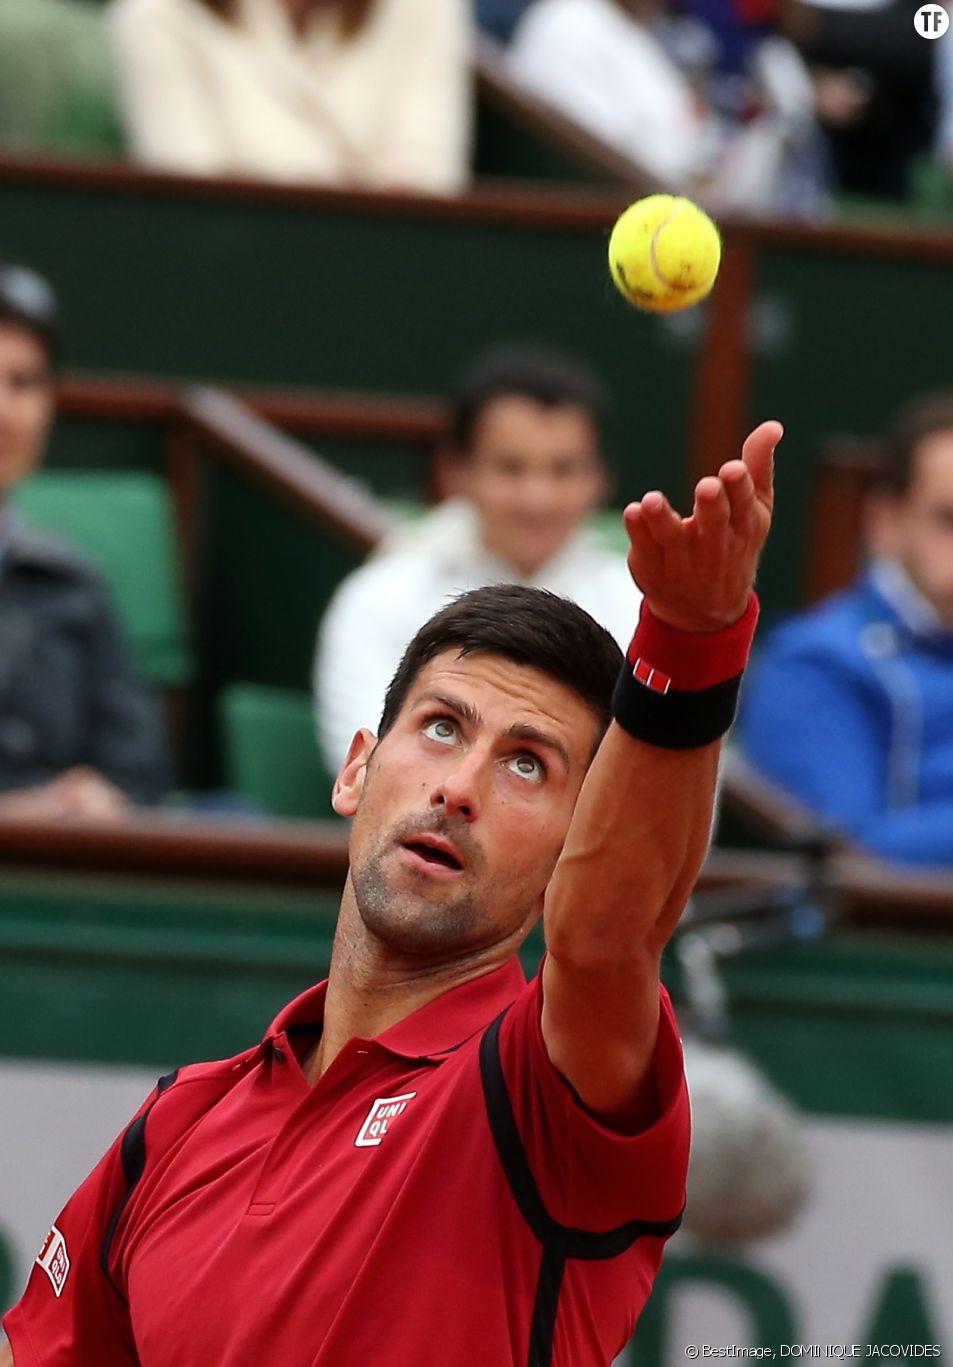 Le Serbe Novak Djokovic, numéro 1 mondial